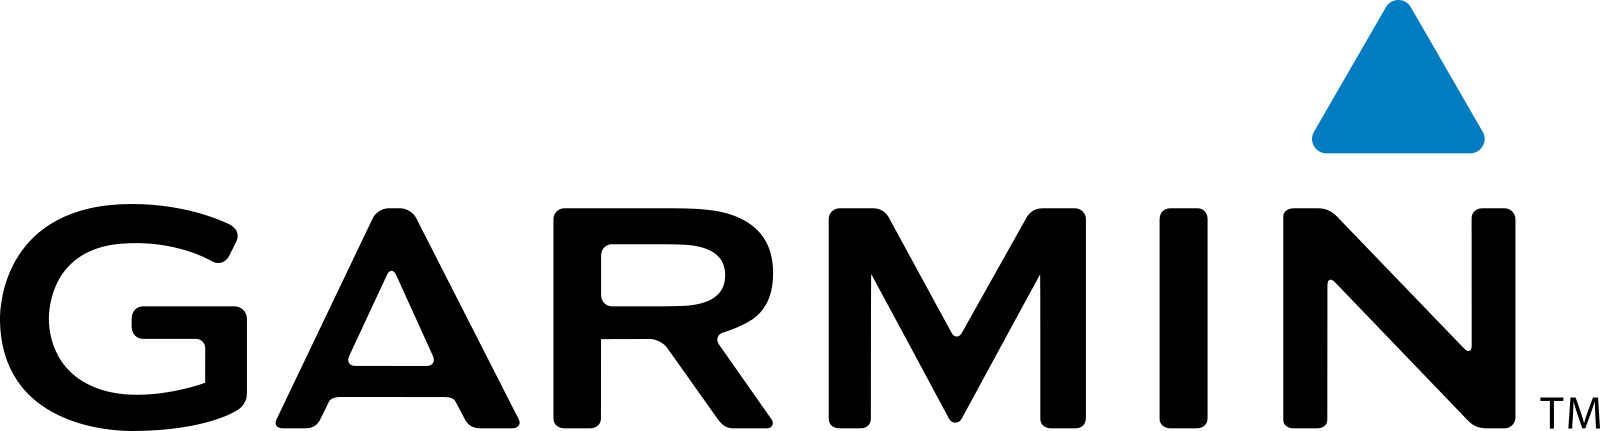 Garmin logo 4 - Garmin Logo